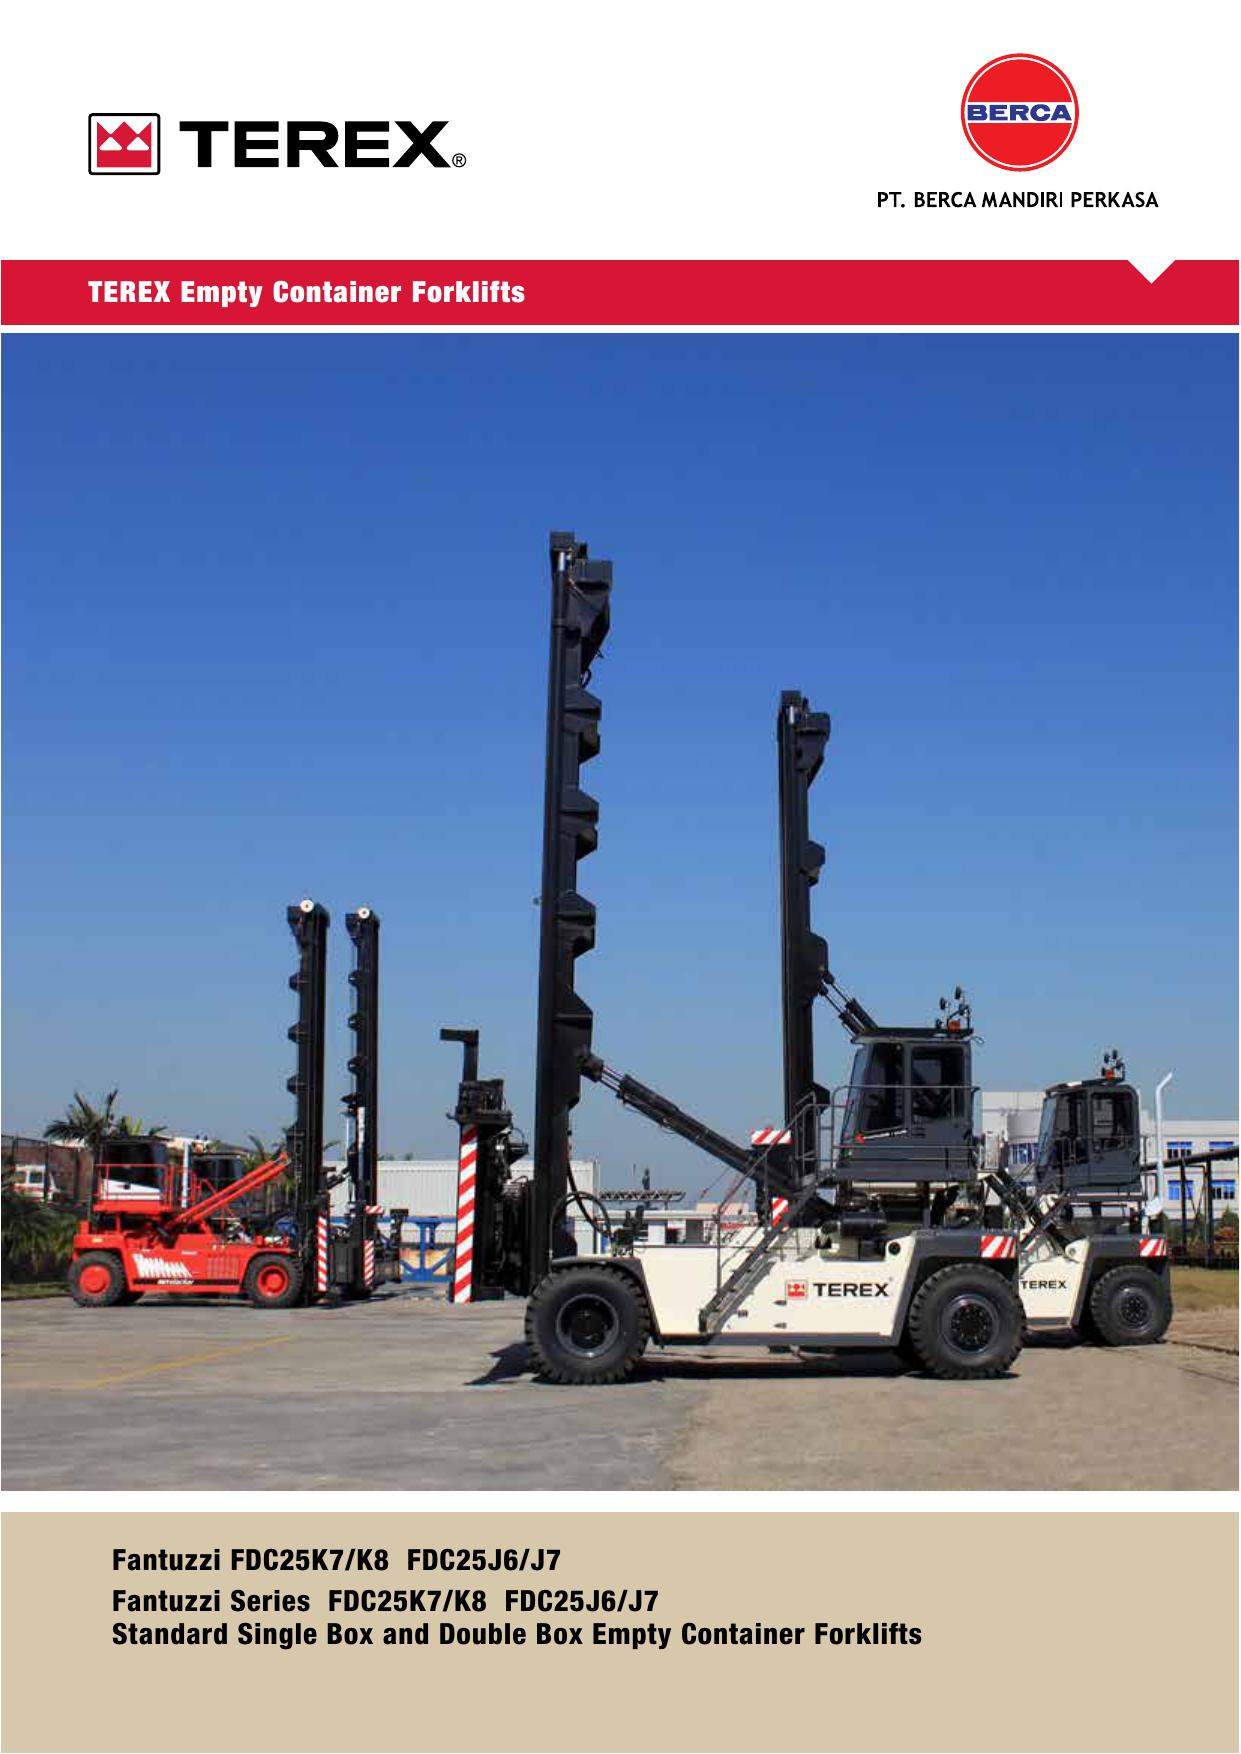 TEREX Empty Container Forklifts Fantuzzi | manualzz.com on